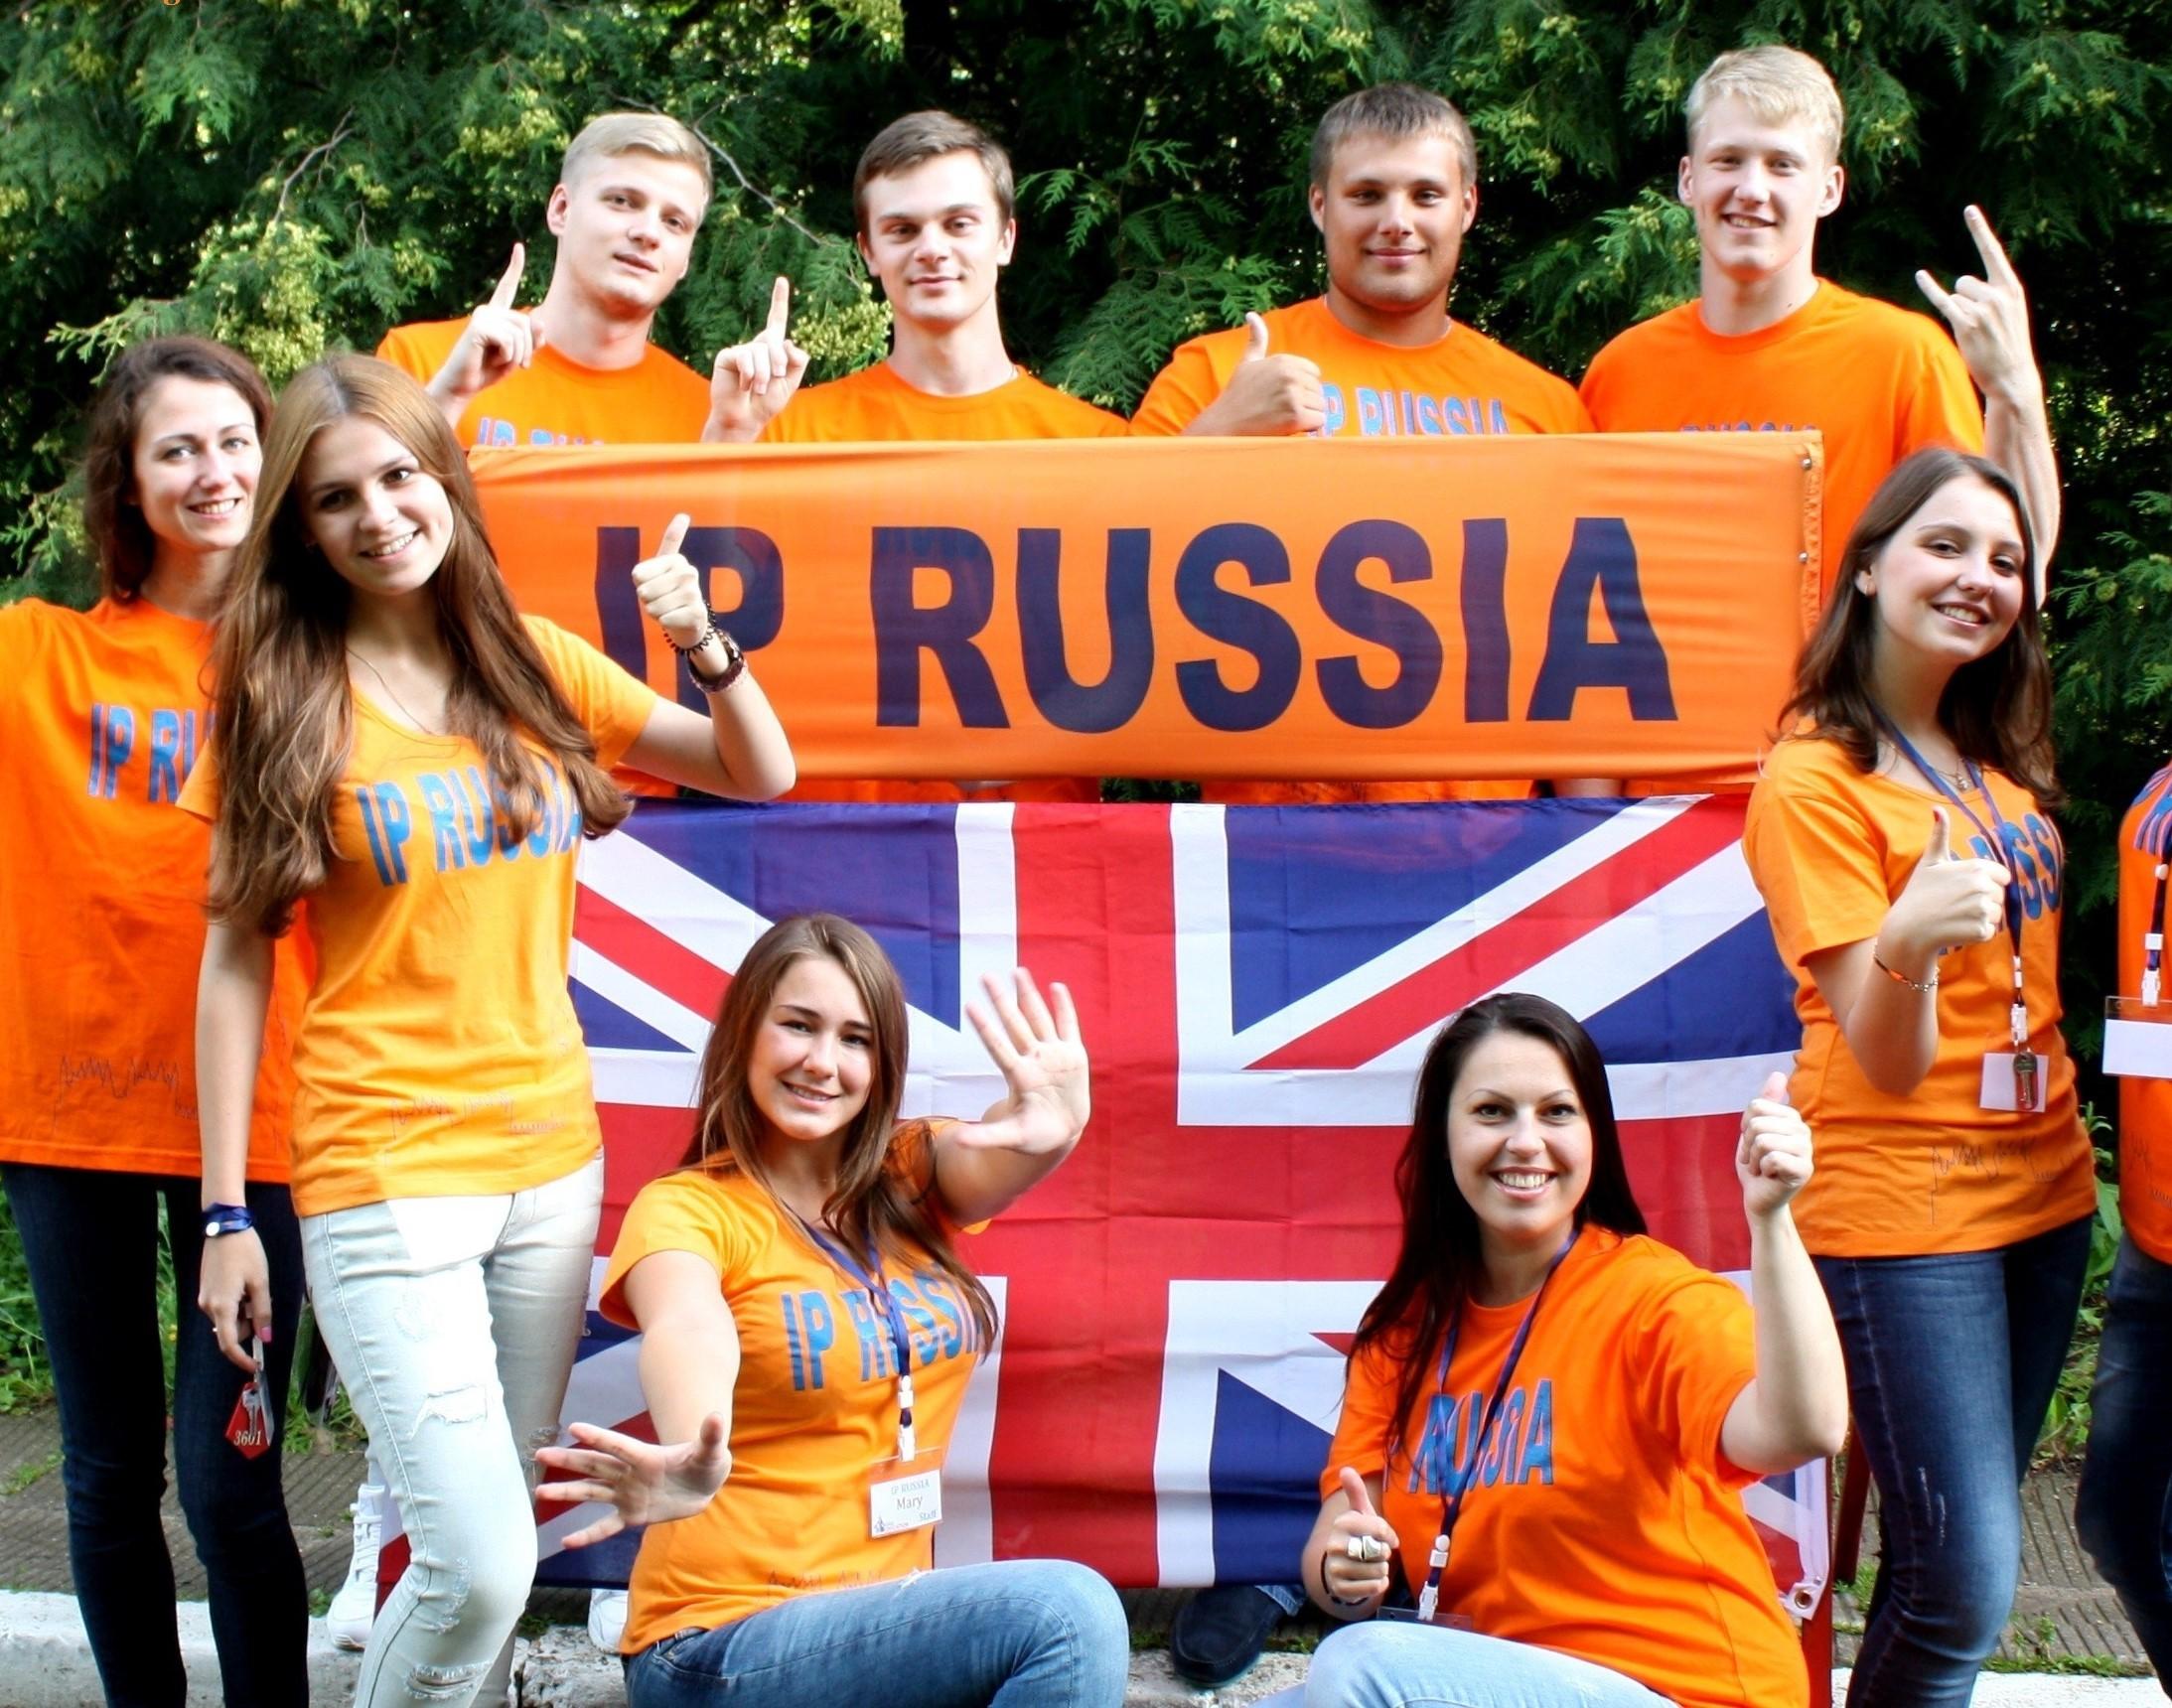 IP Russia